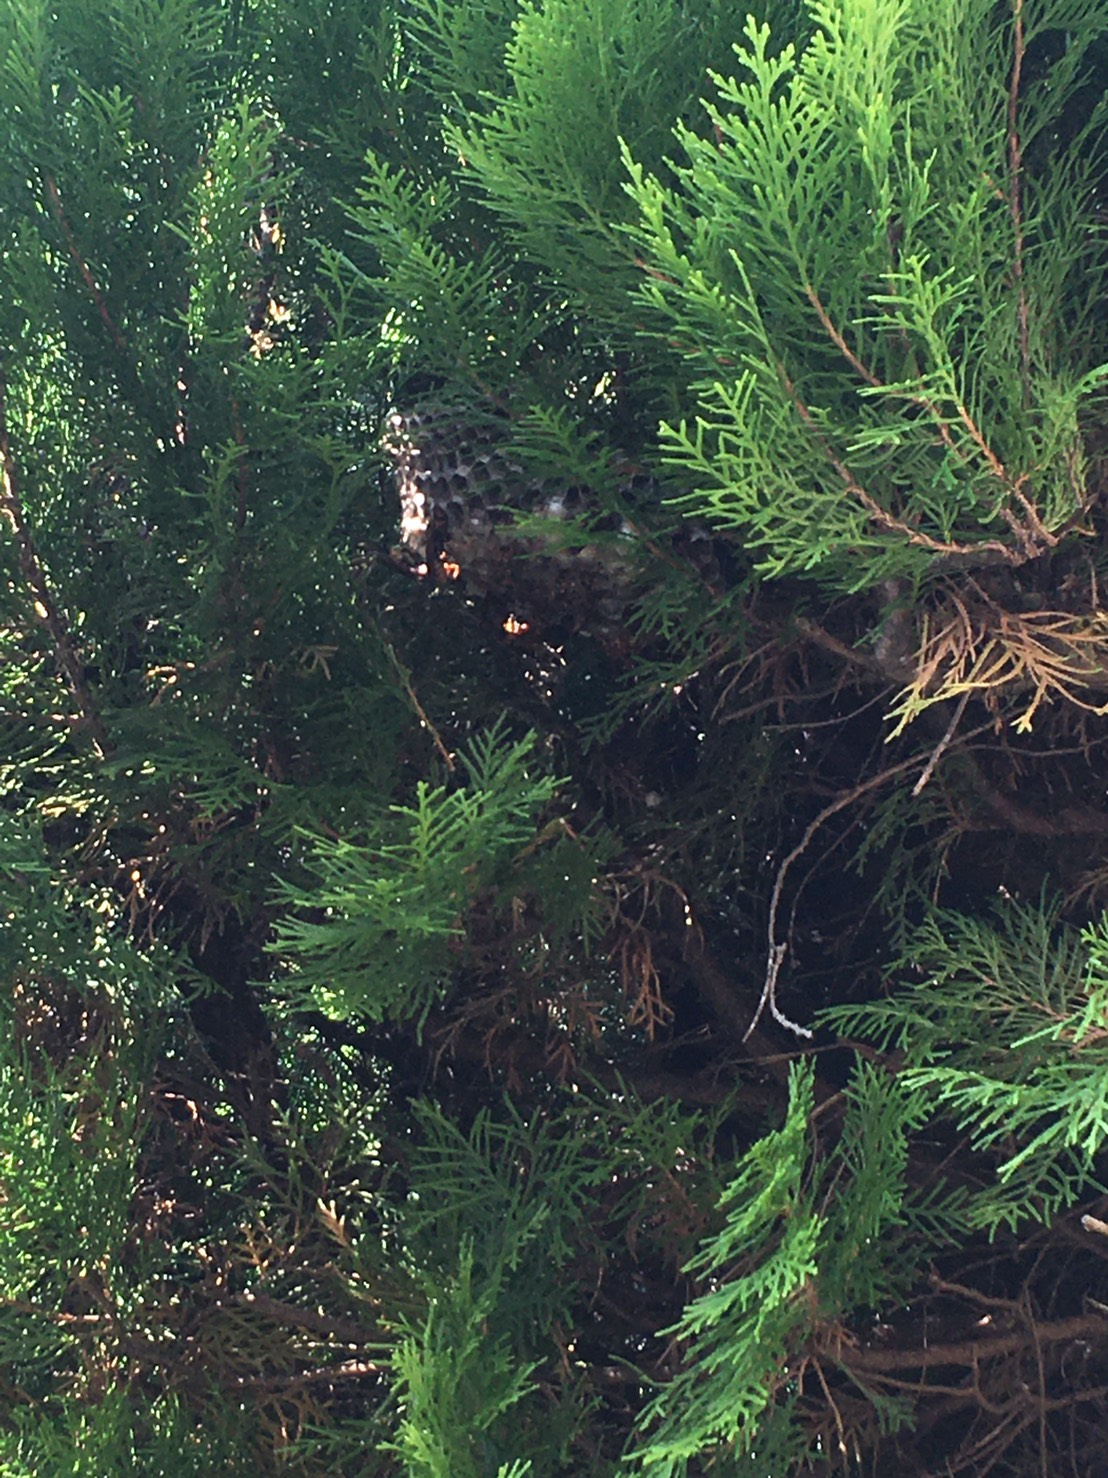 千葉県柏市豊四季の蜂の巣駆除現場